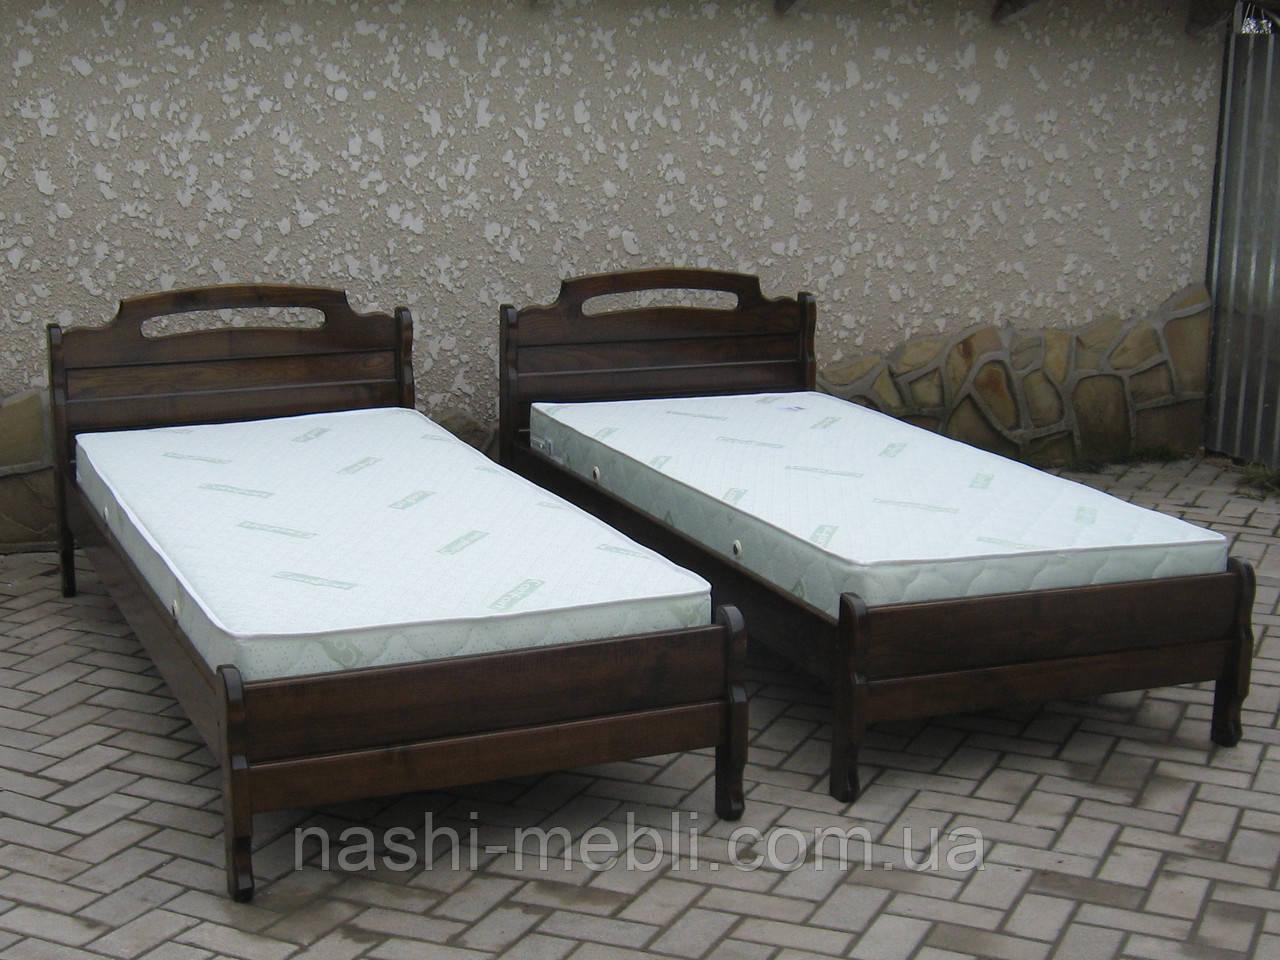 Одоспальне ліжко Ясен Радуга 5